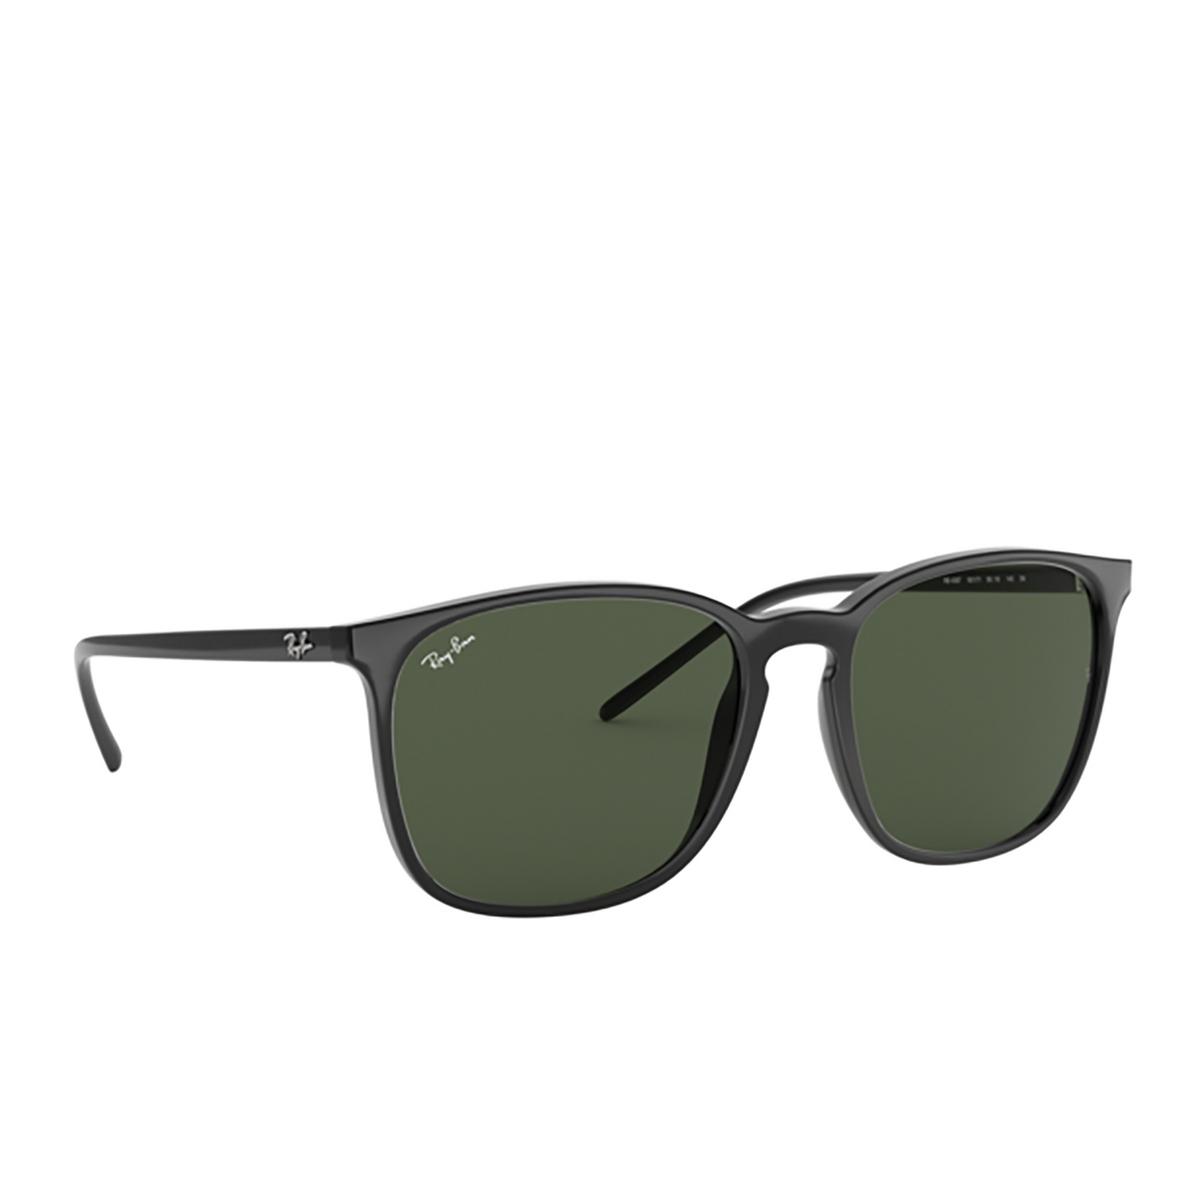 Ray-Ban® Square Sunglasses: RB4387 color Black 601/71 - 2/3.